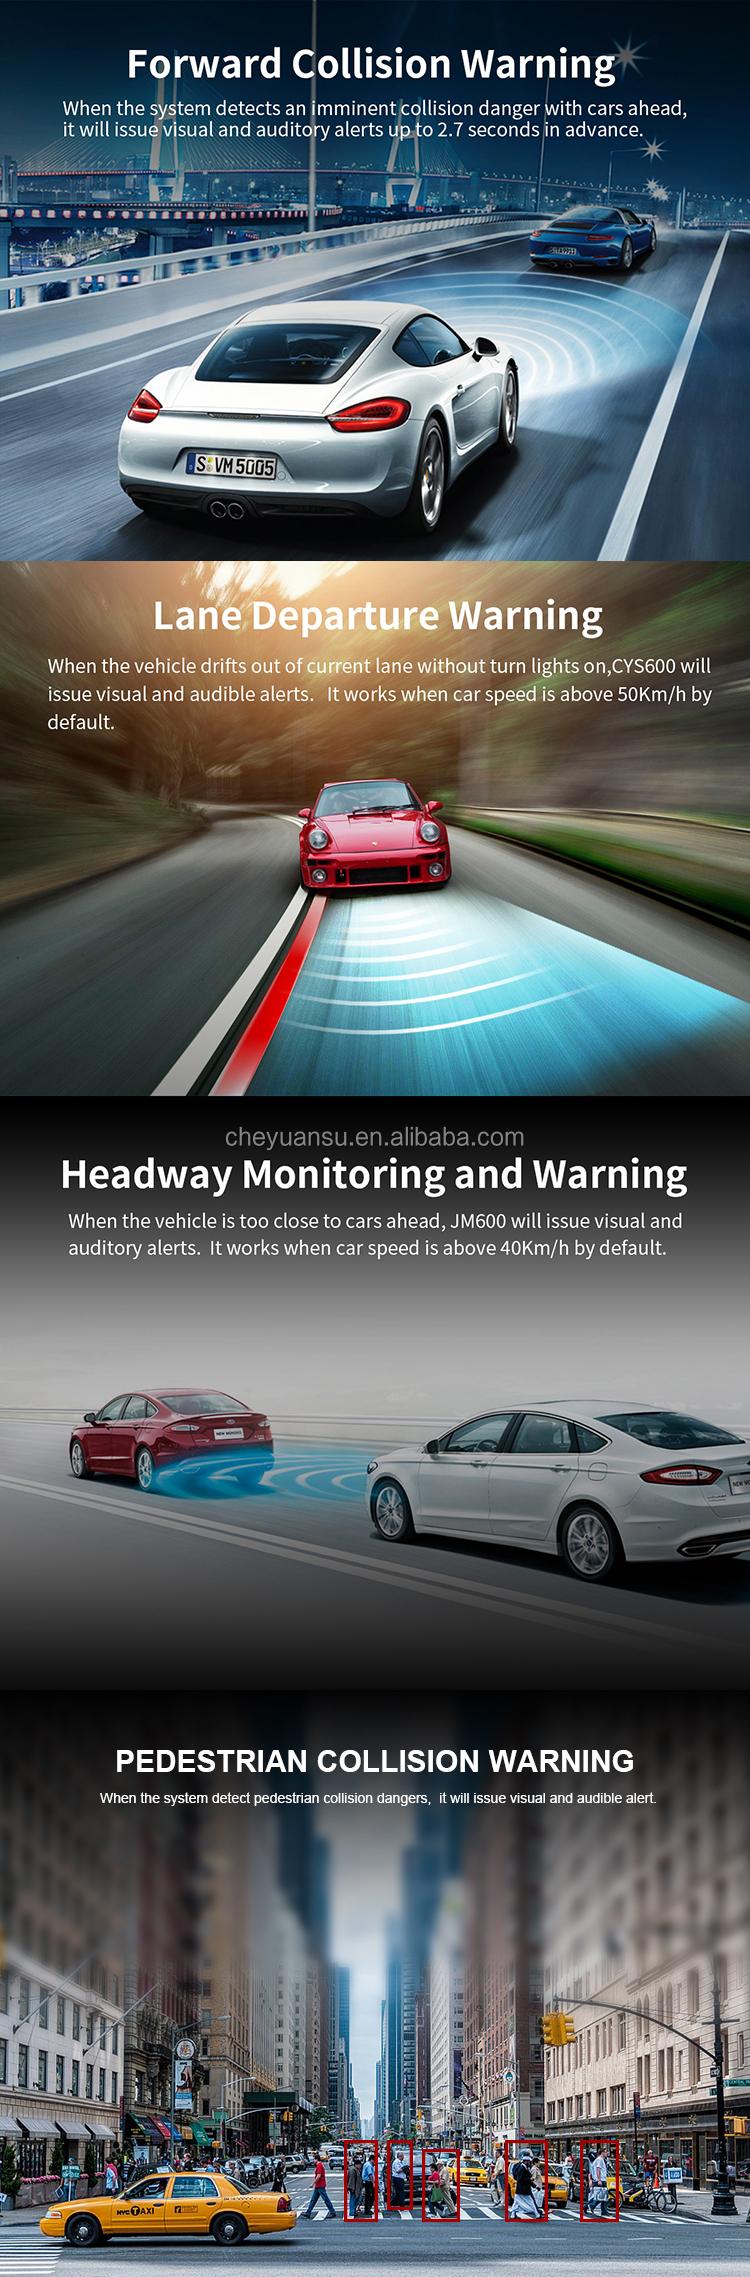 Adas 運転記録抗レーン逸脱警告 LDWS & FCWS 前方衝突警報システム